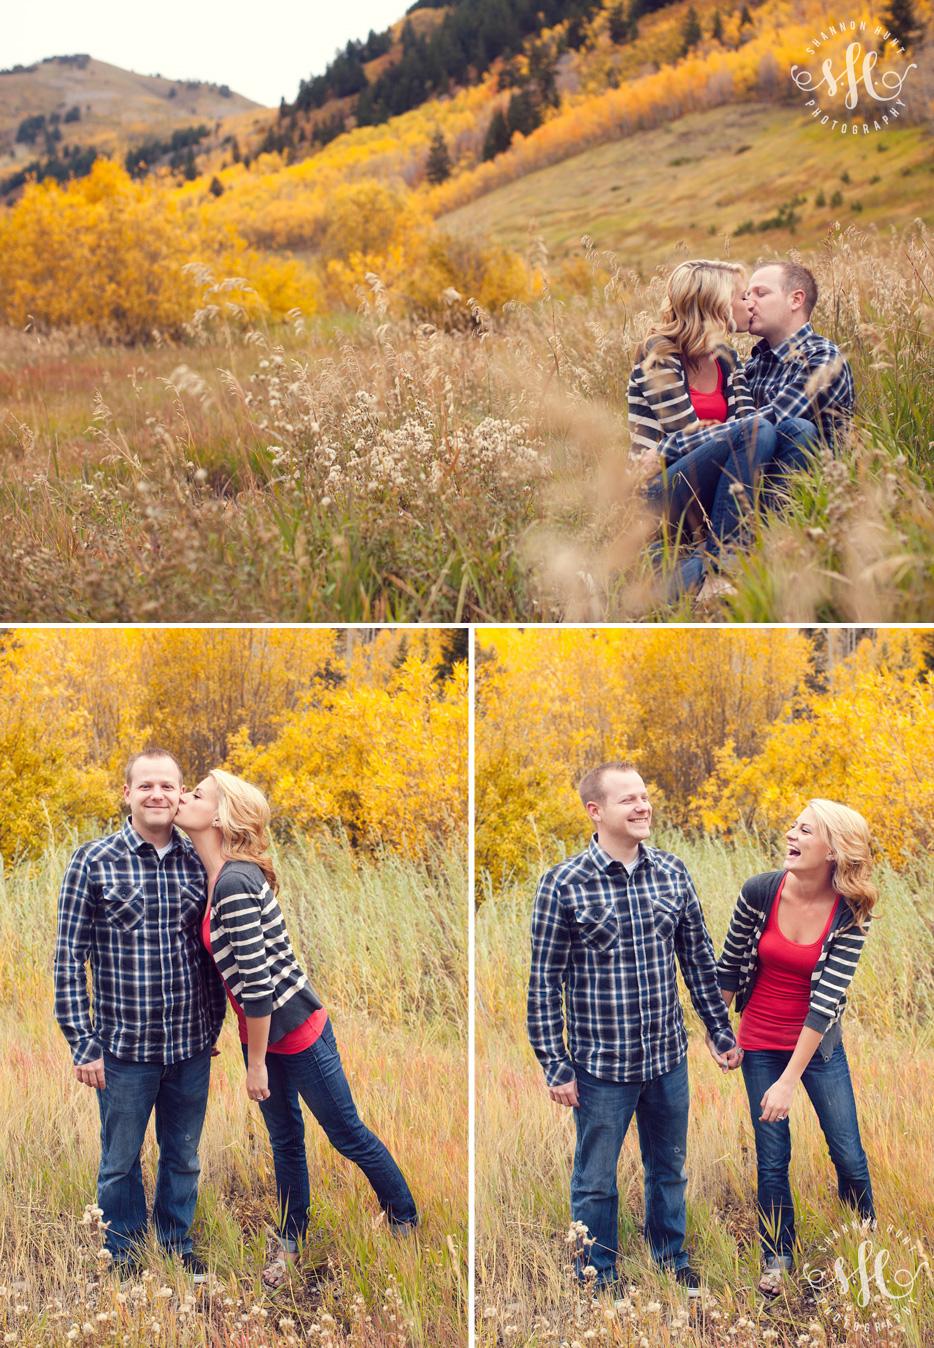 engagement photographers salt lake city utah temple texas dallas couples